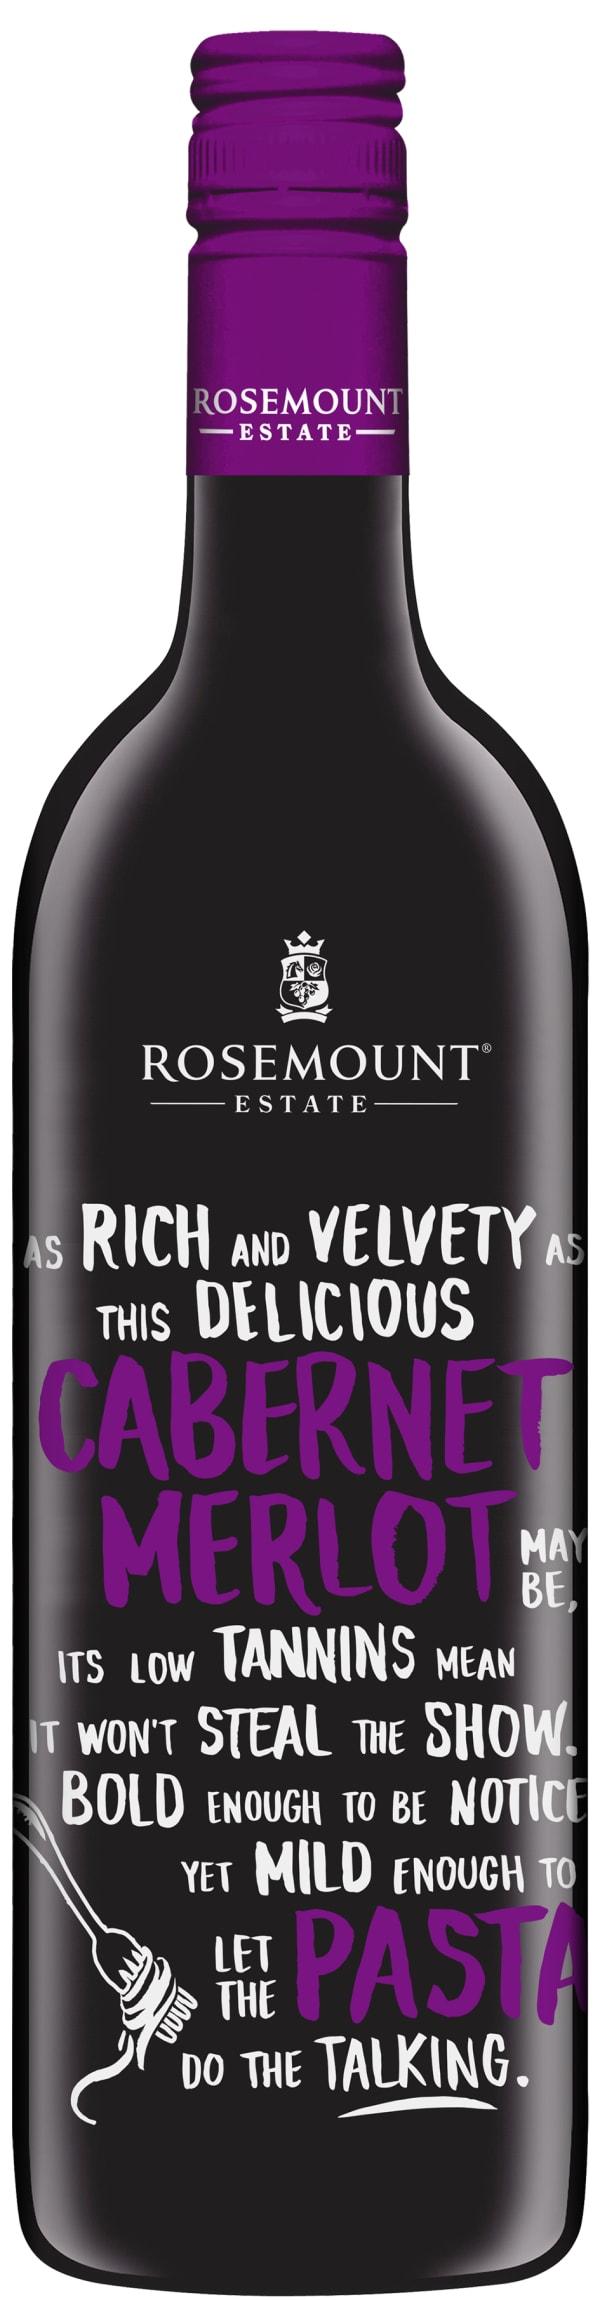 Rosemount Pasta Cabernet Merlot 2015